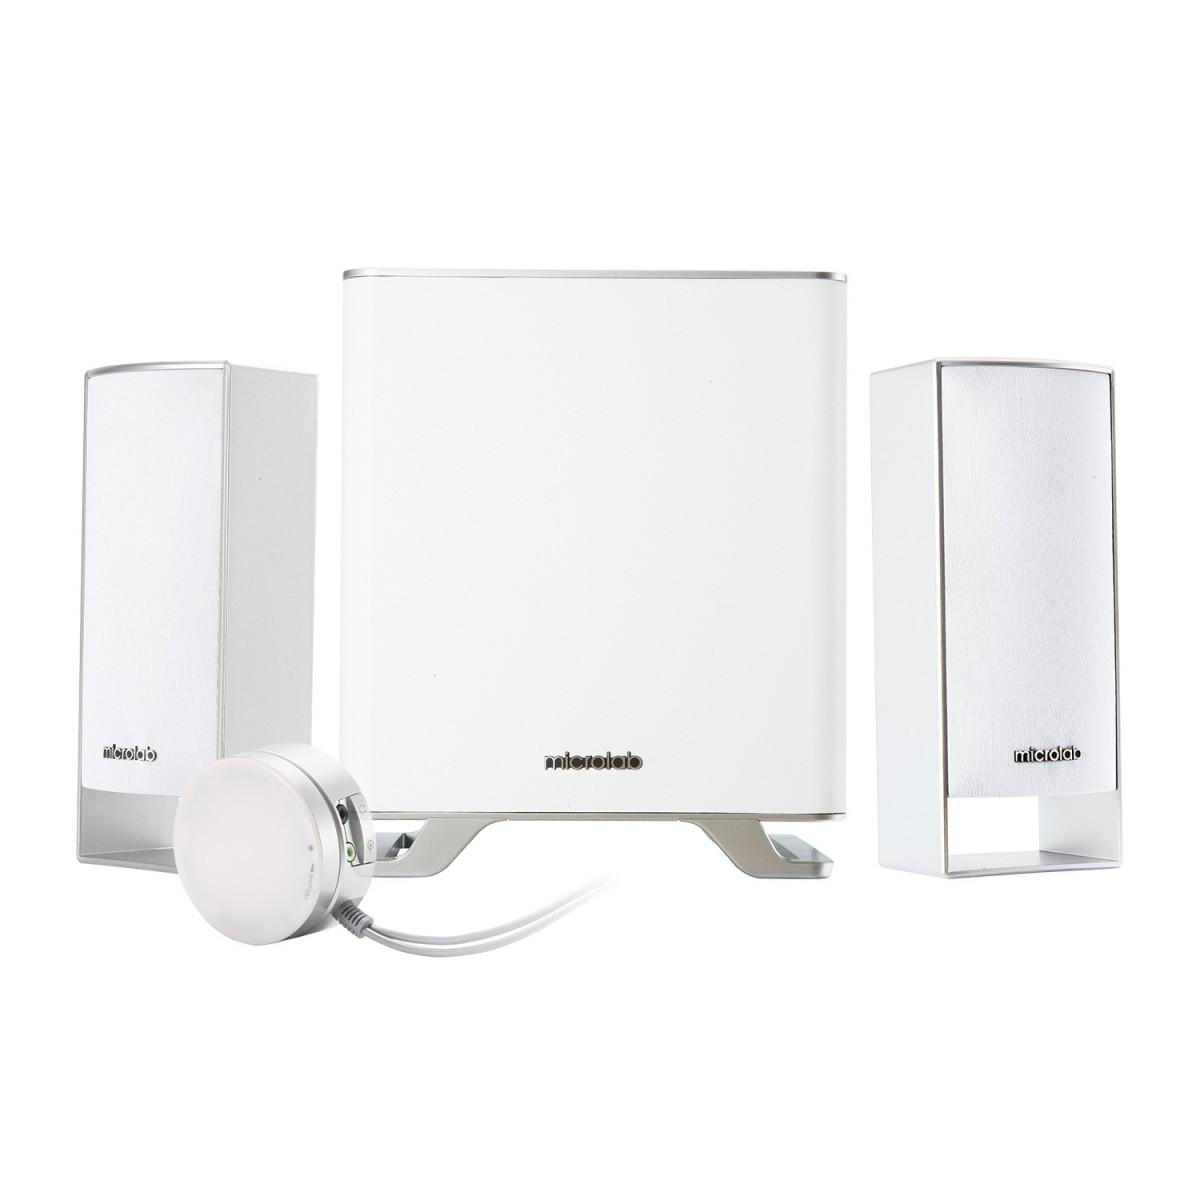 2,1 Microlab 2.1 M-600 White